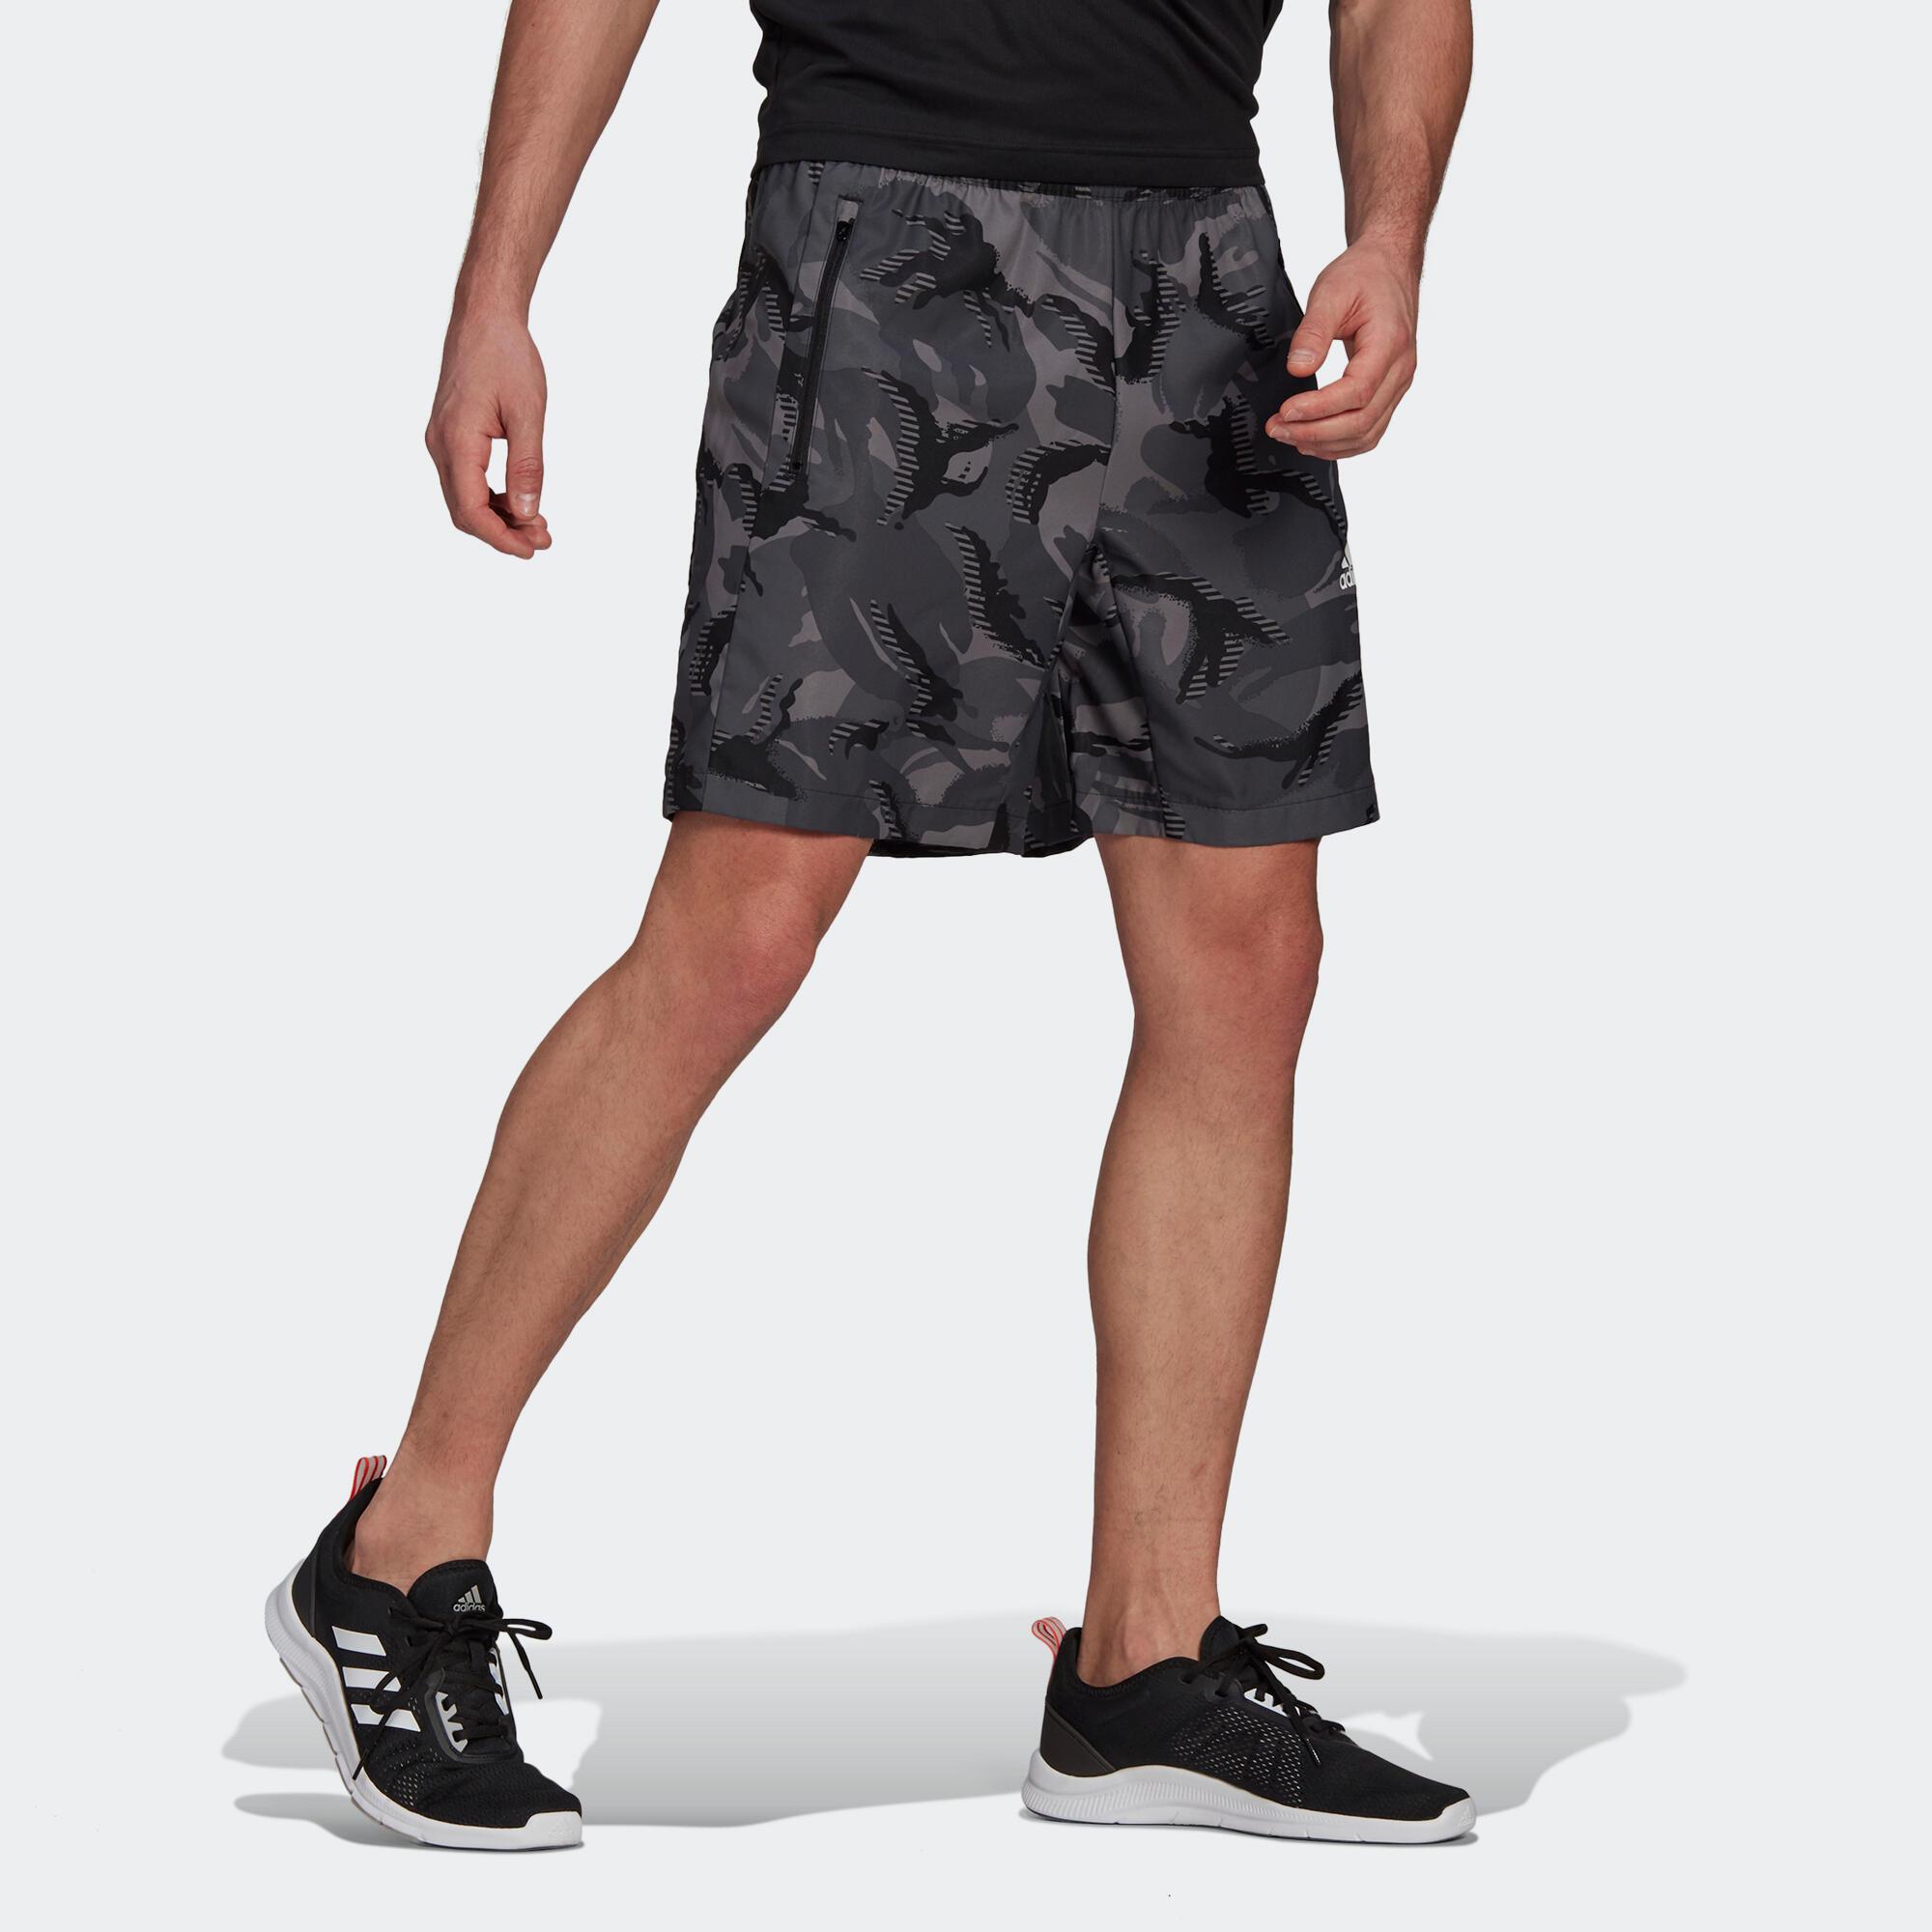 Şort Fitness Cardio Adidas imagine